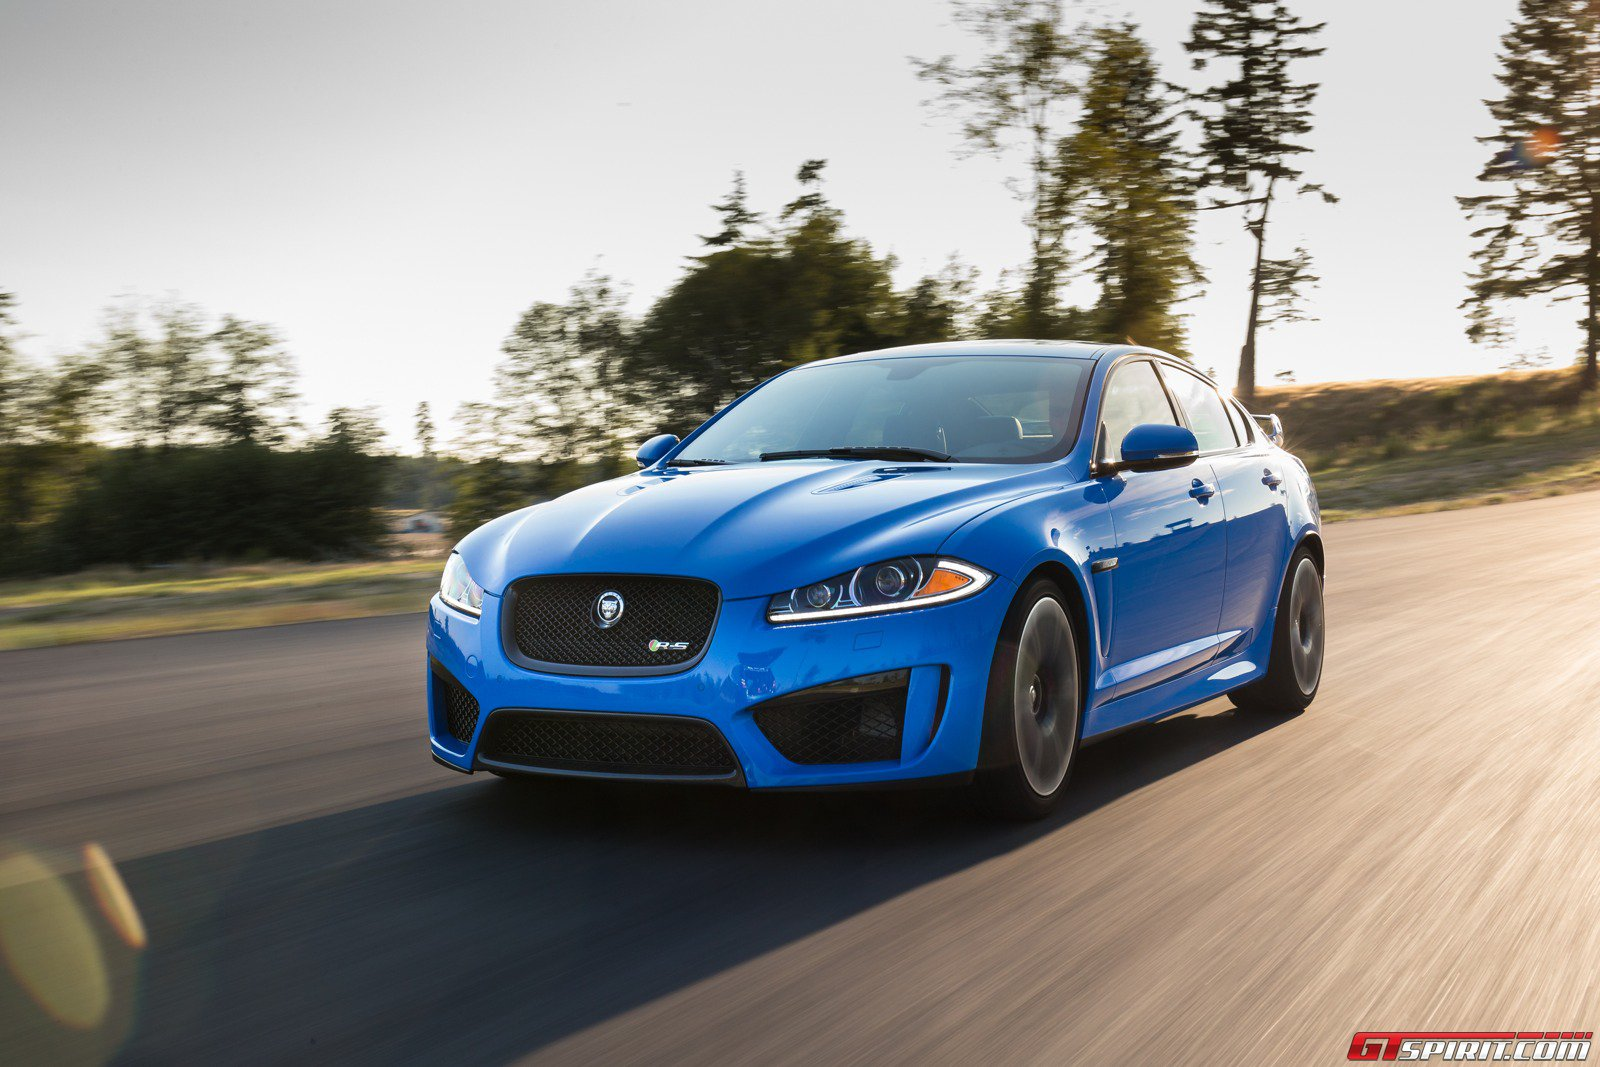 2015 Jaguar XF Range Expanded With New Prices - GTspirit